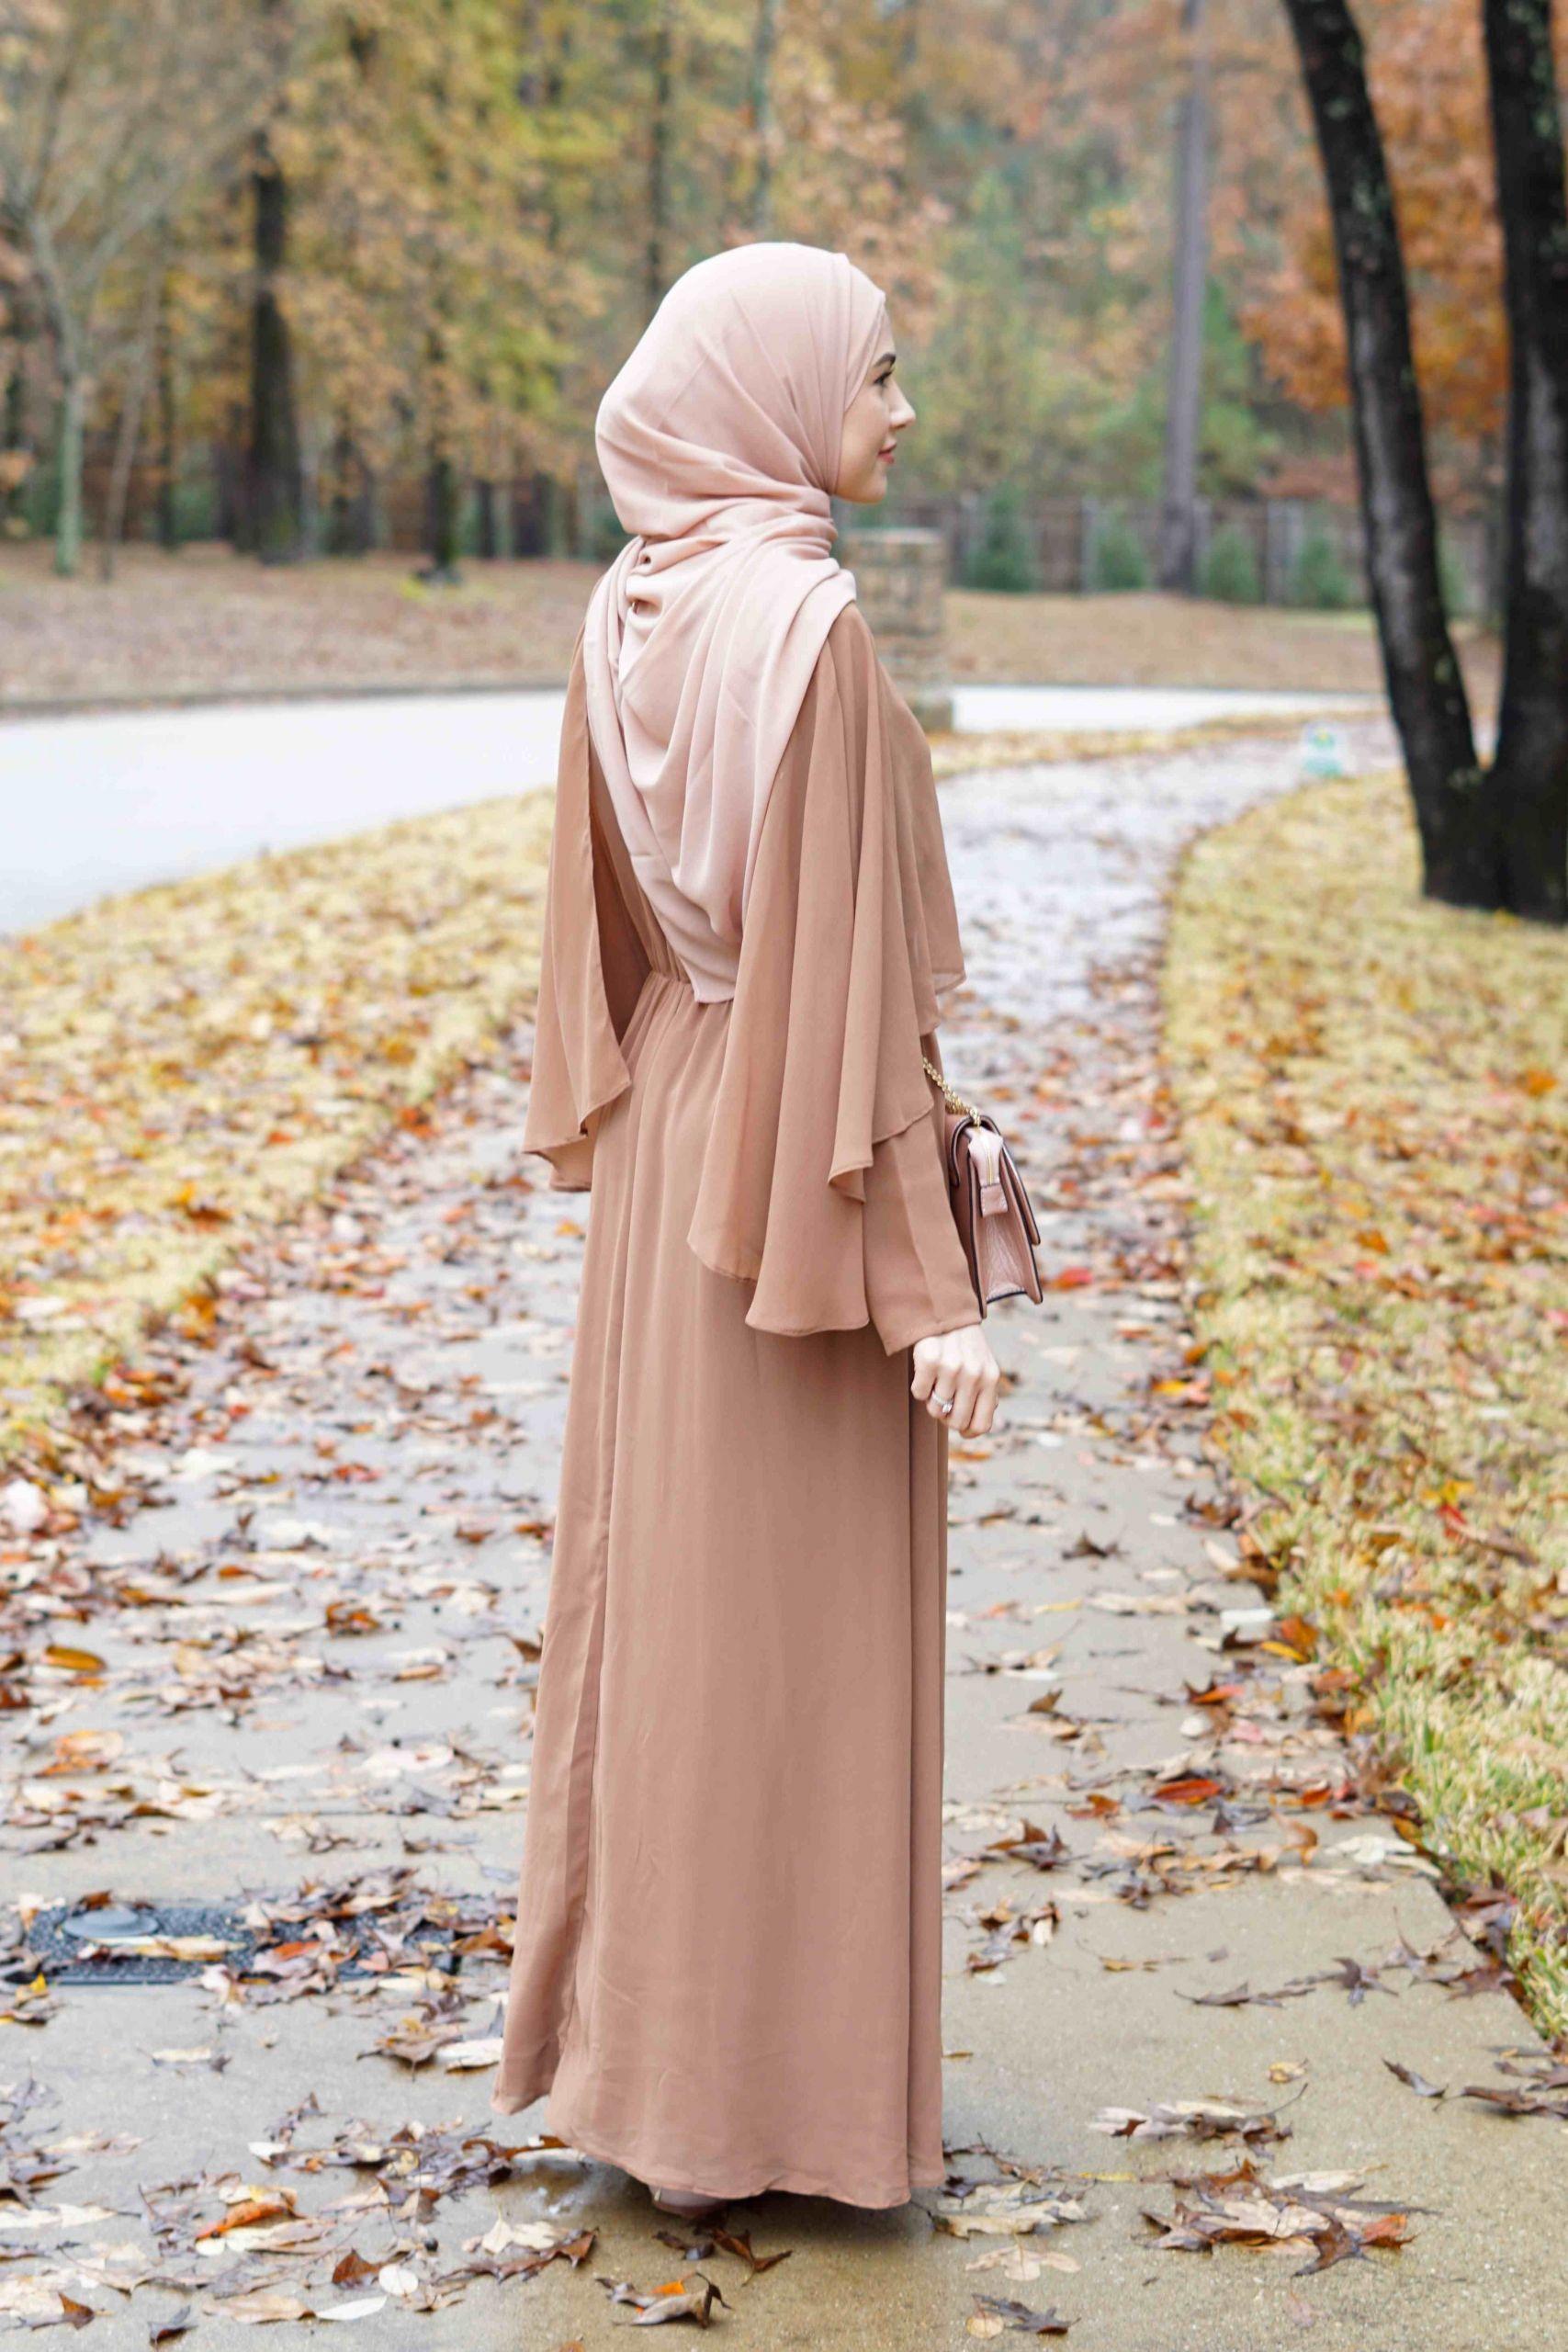 Ide Fashion Muslimah E6d5 ριитєяєѕт Inxspiration